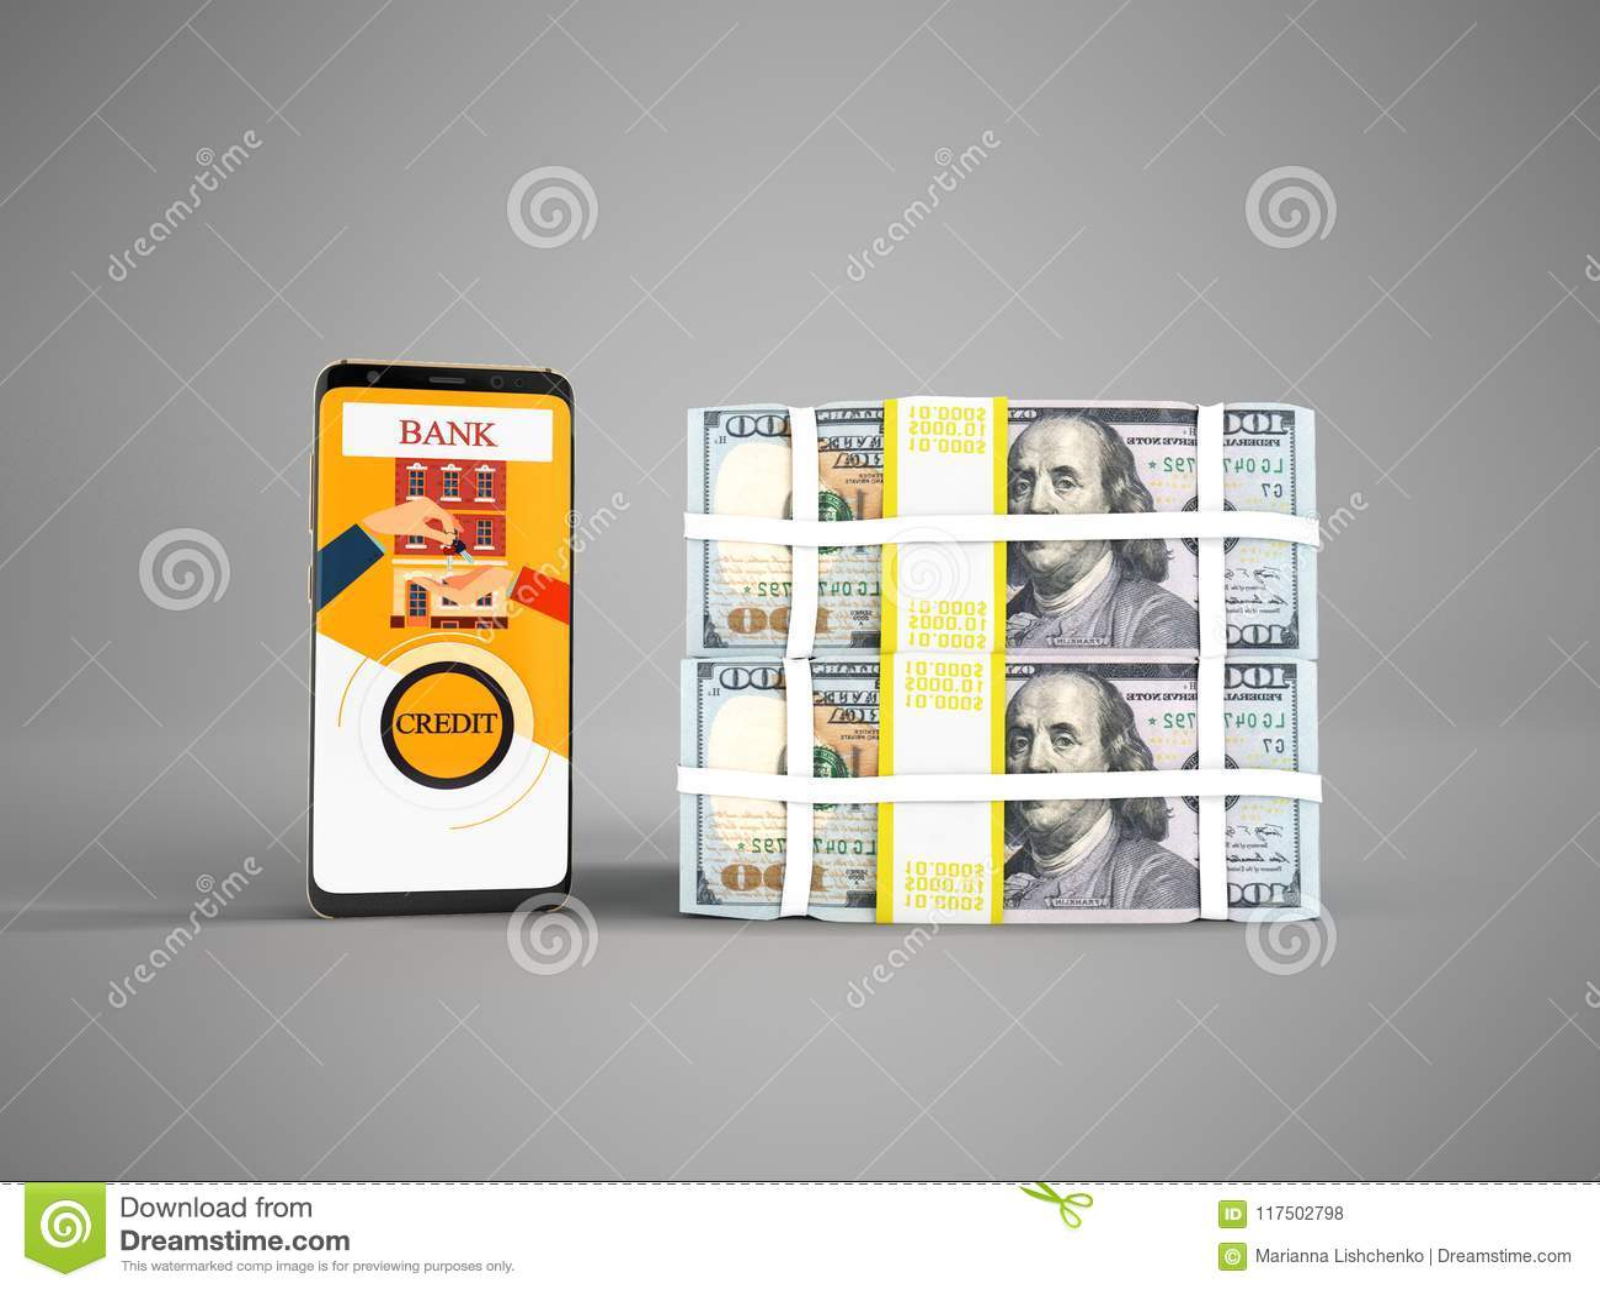 Концепция займа через телефон в банке в долларах 3d представляет на gr